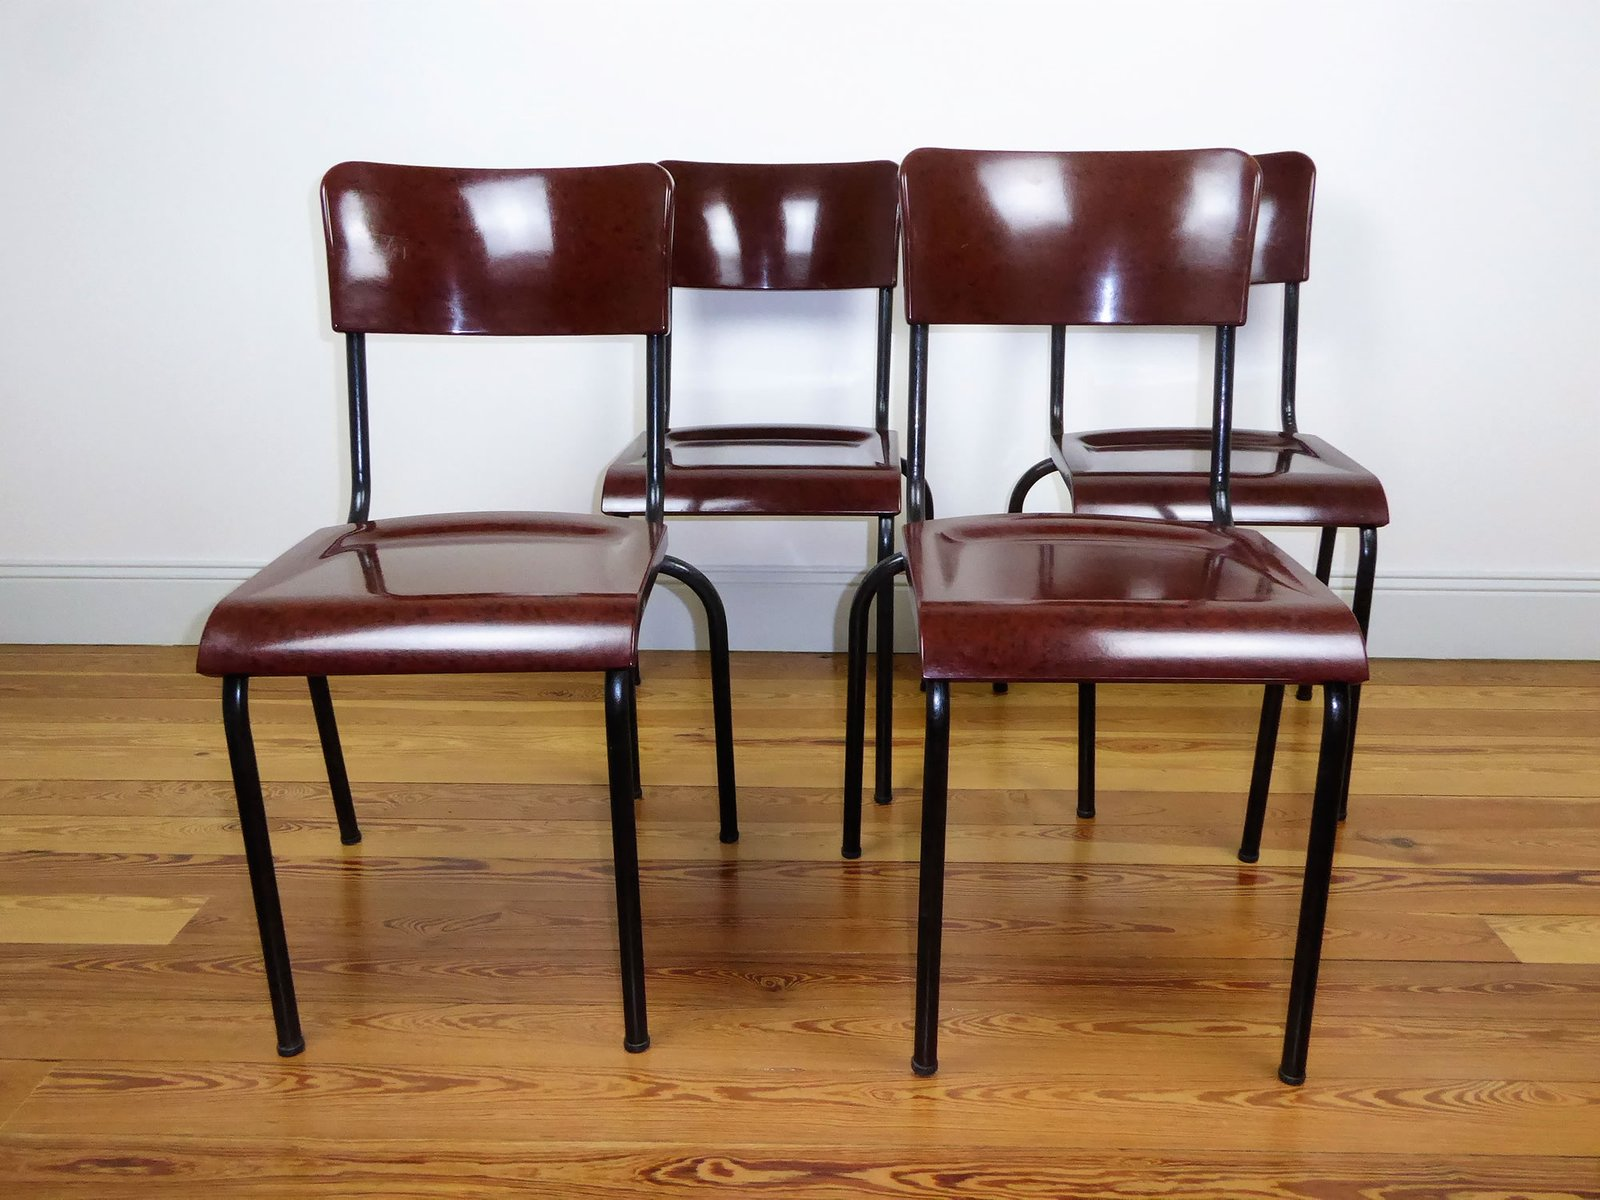 Sedie in metallo e bachelite di rené herbst anni 40 set di 4 in